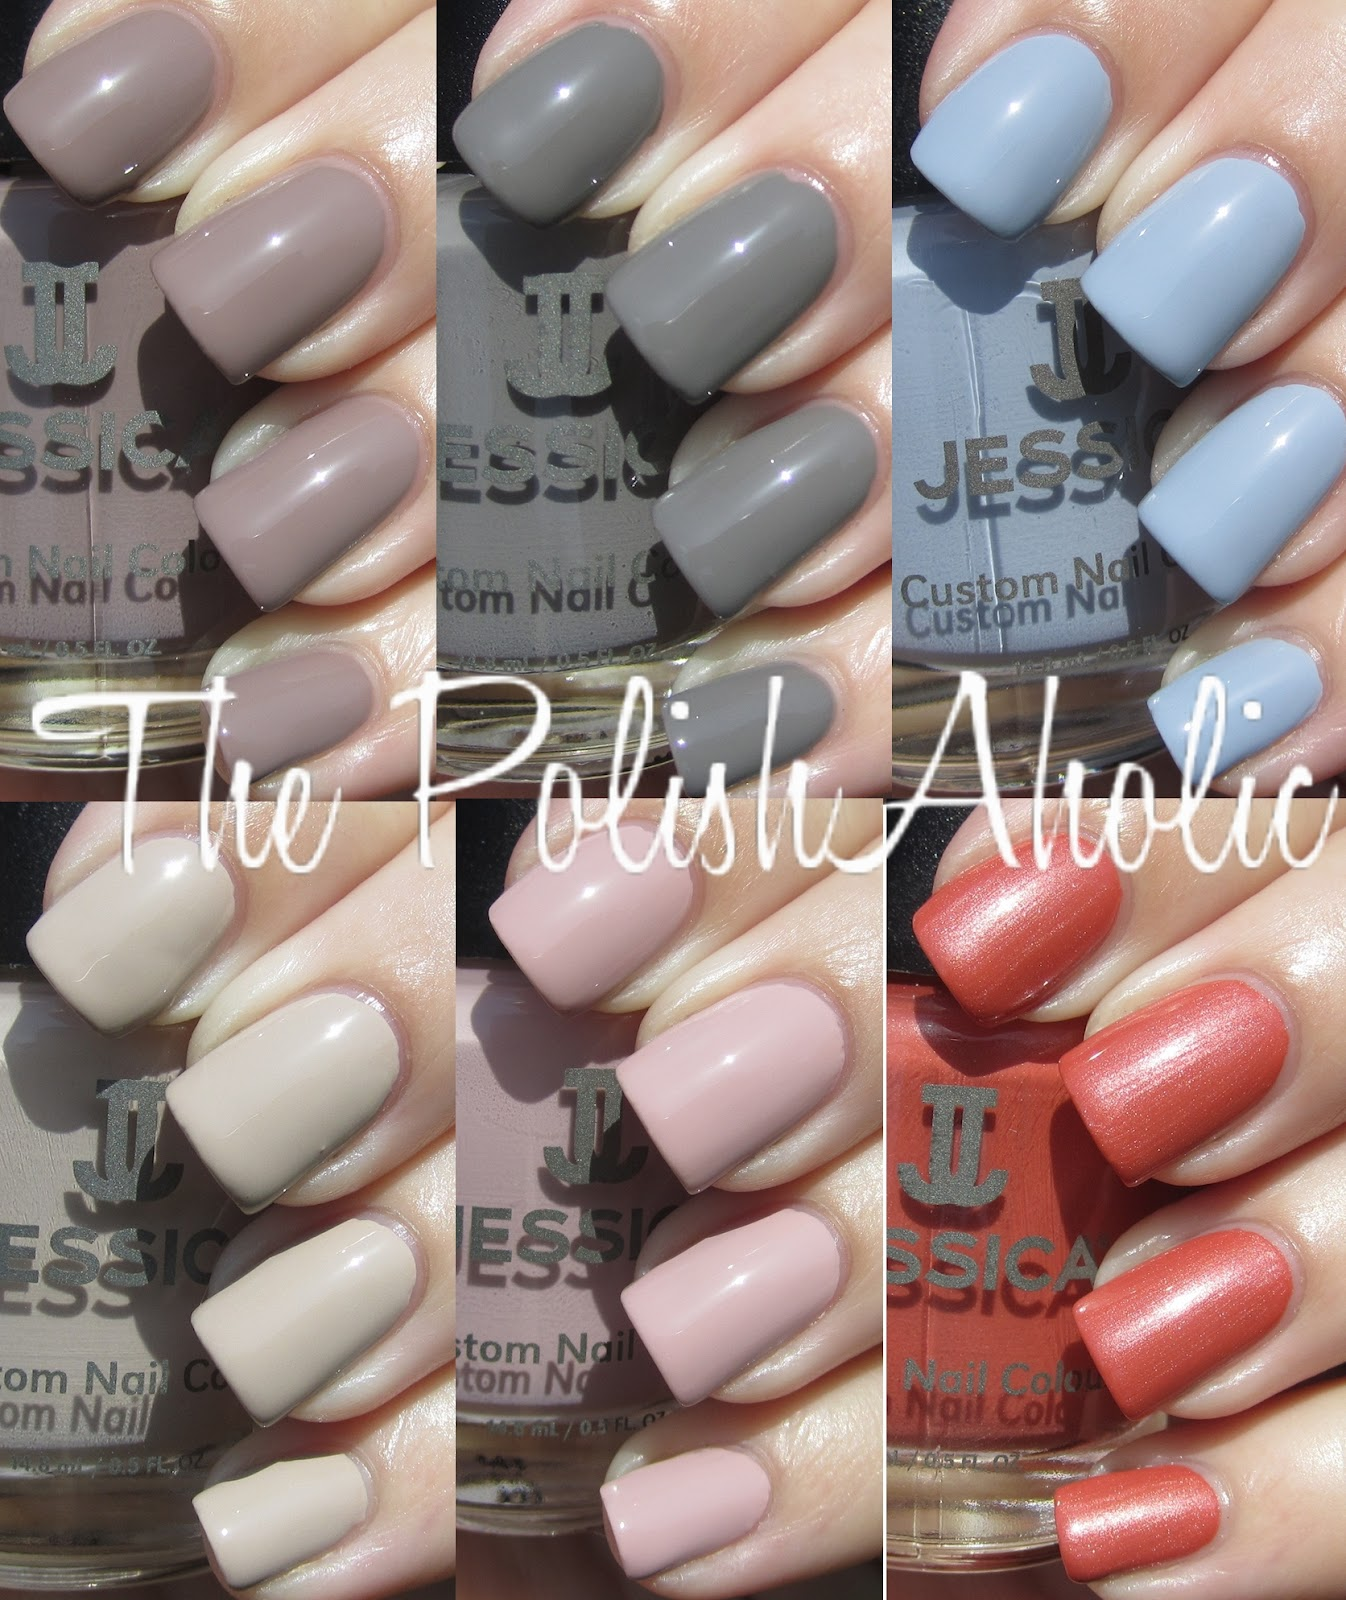 The PolishAholic: Jessica Awakening Collection Swatches!